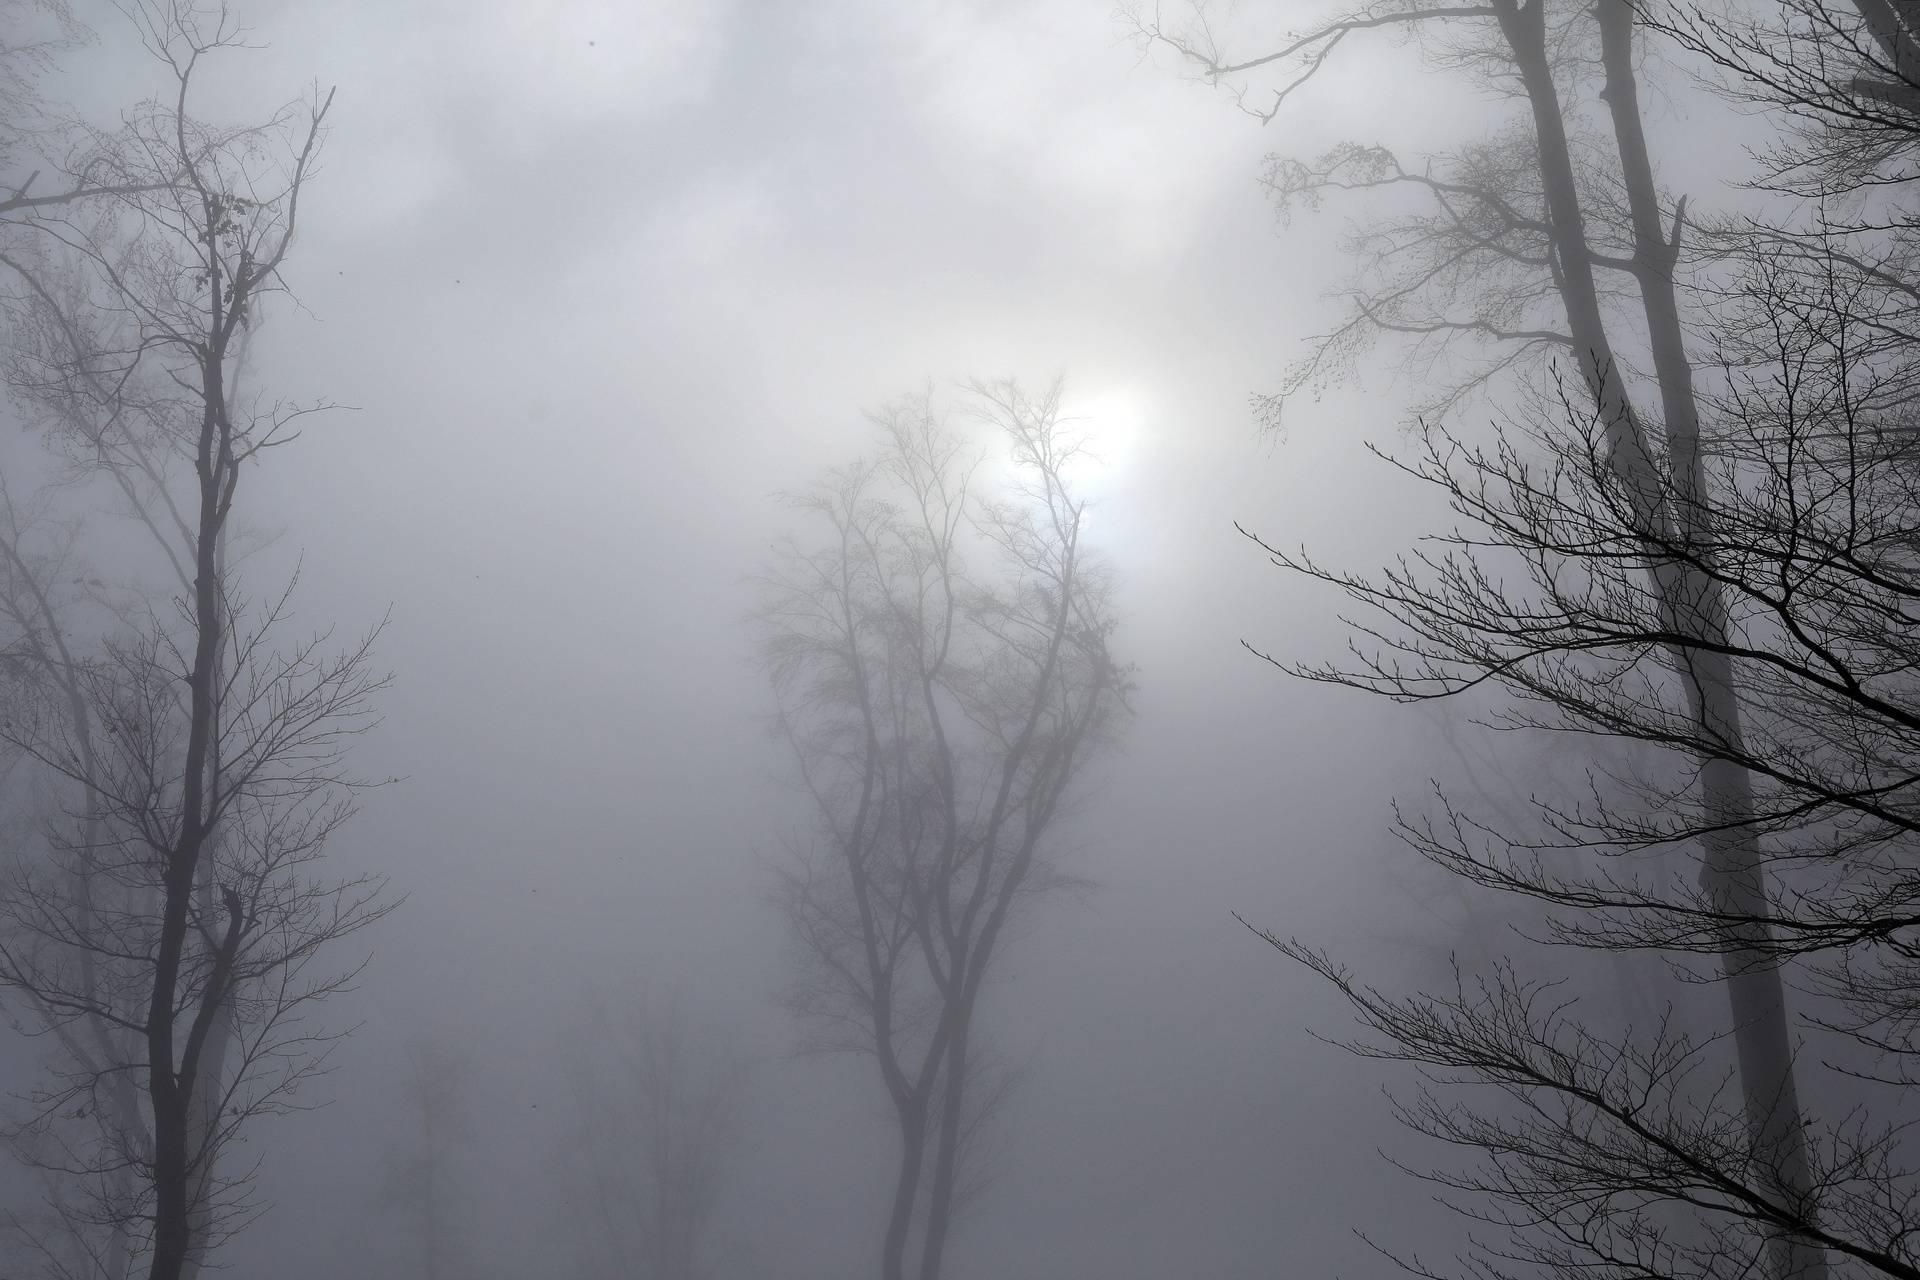 Jesensko i maglovito jutro na Sljemenu probudilo Zagrepčane